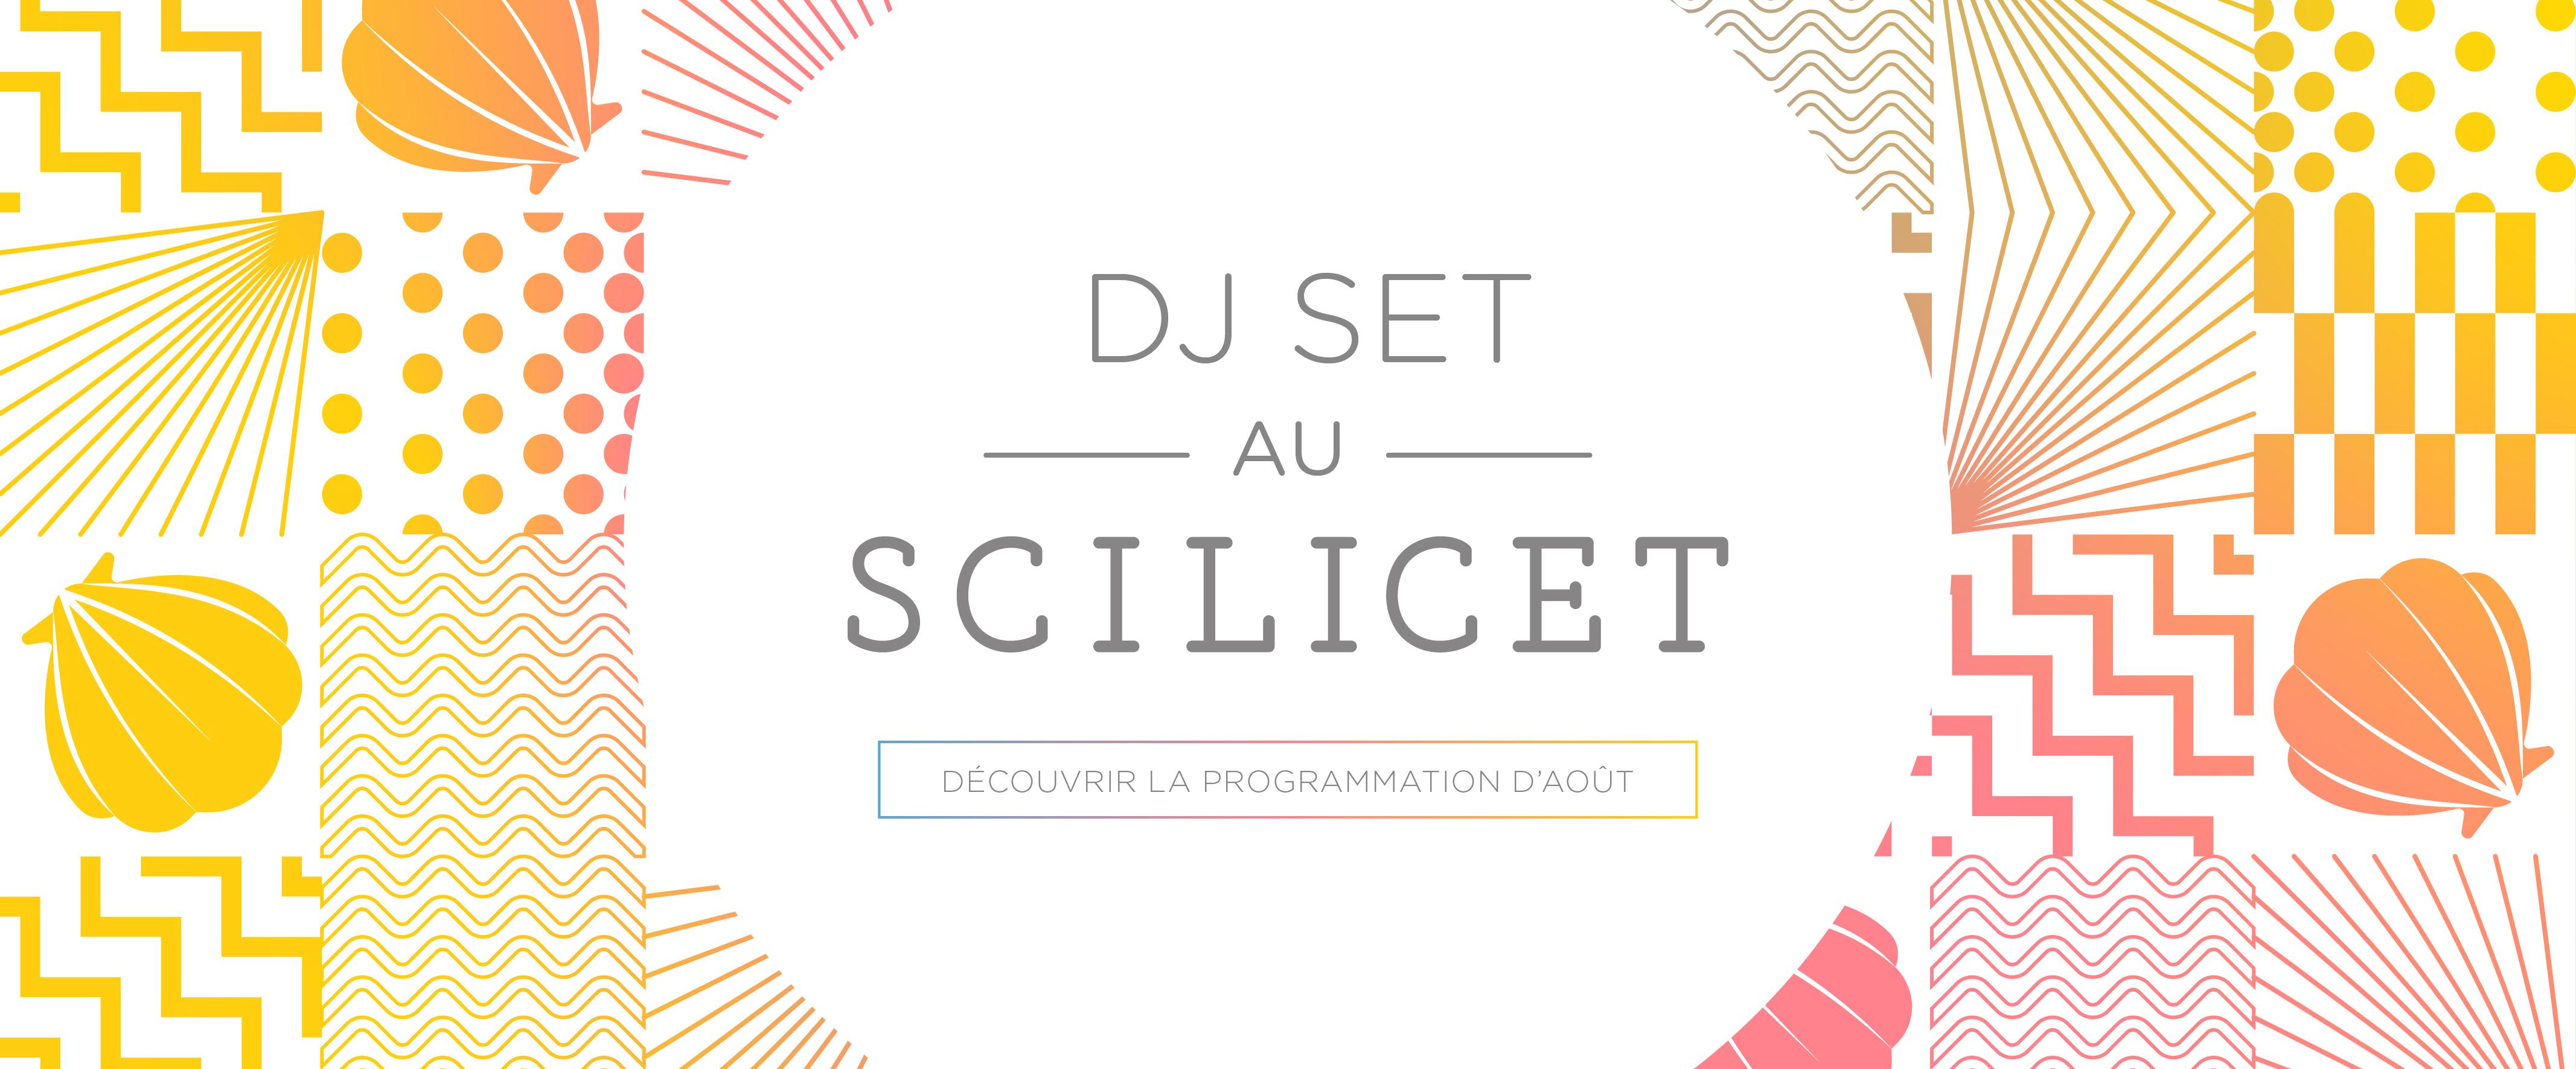 Agenda de la programmation du Scilicet - Août